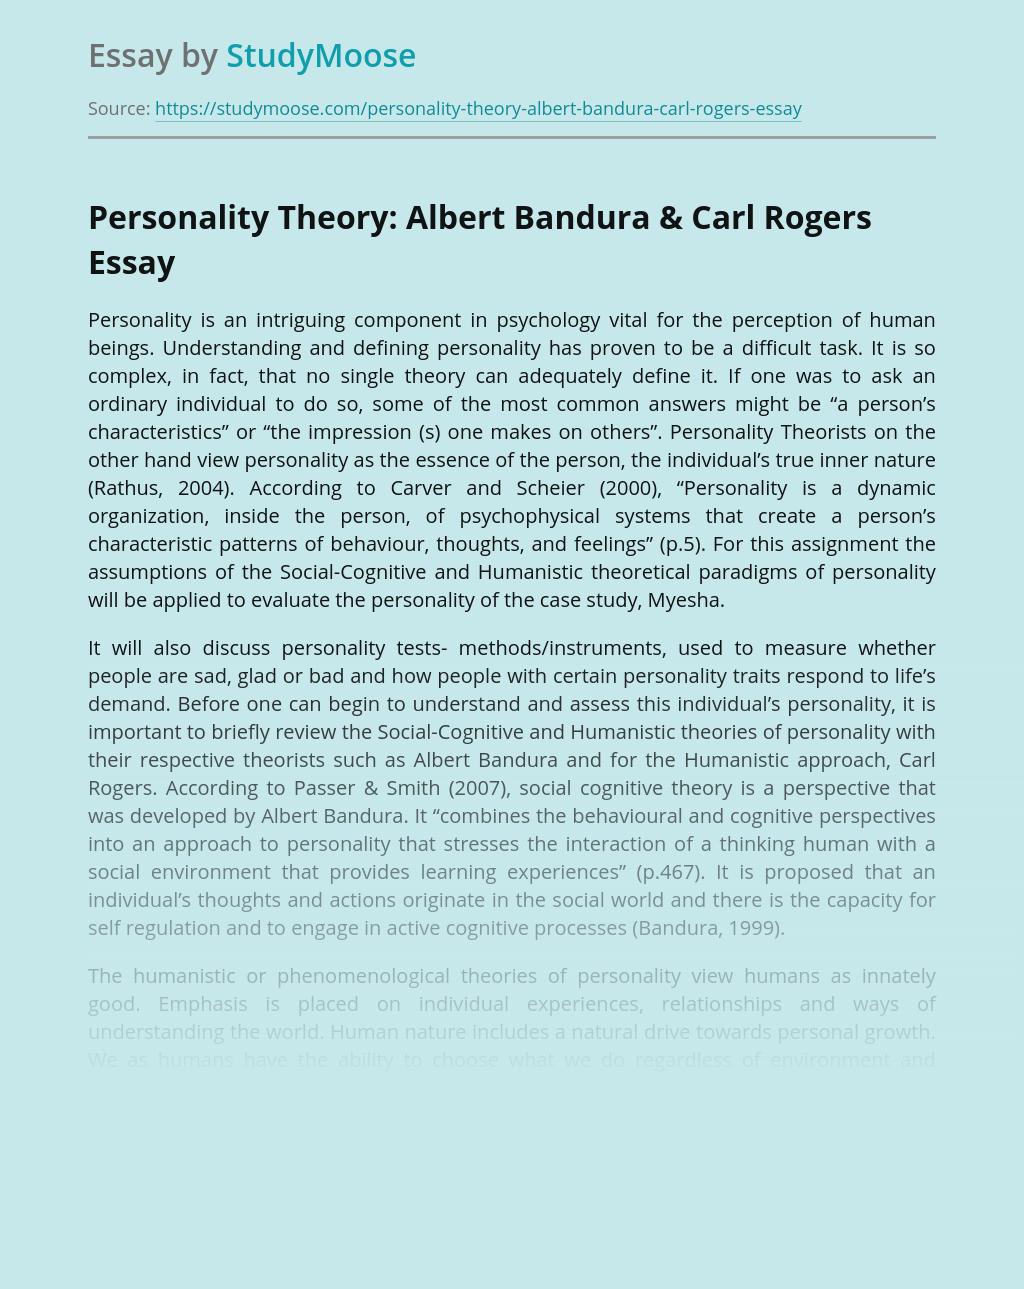 Personality Theory: Albert Bandura & Carl Rogers